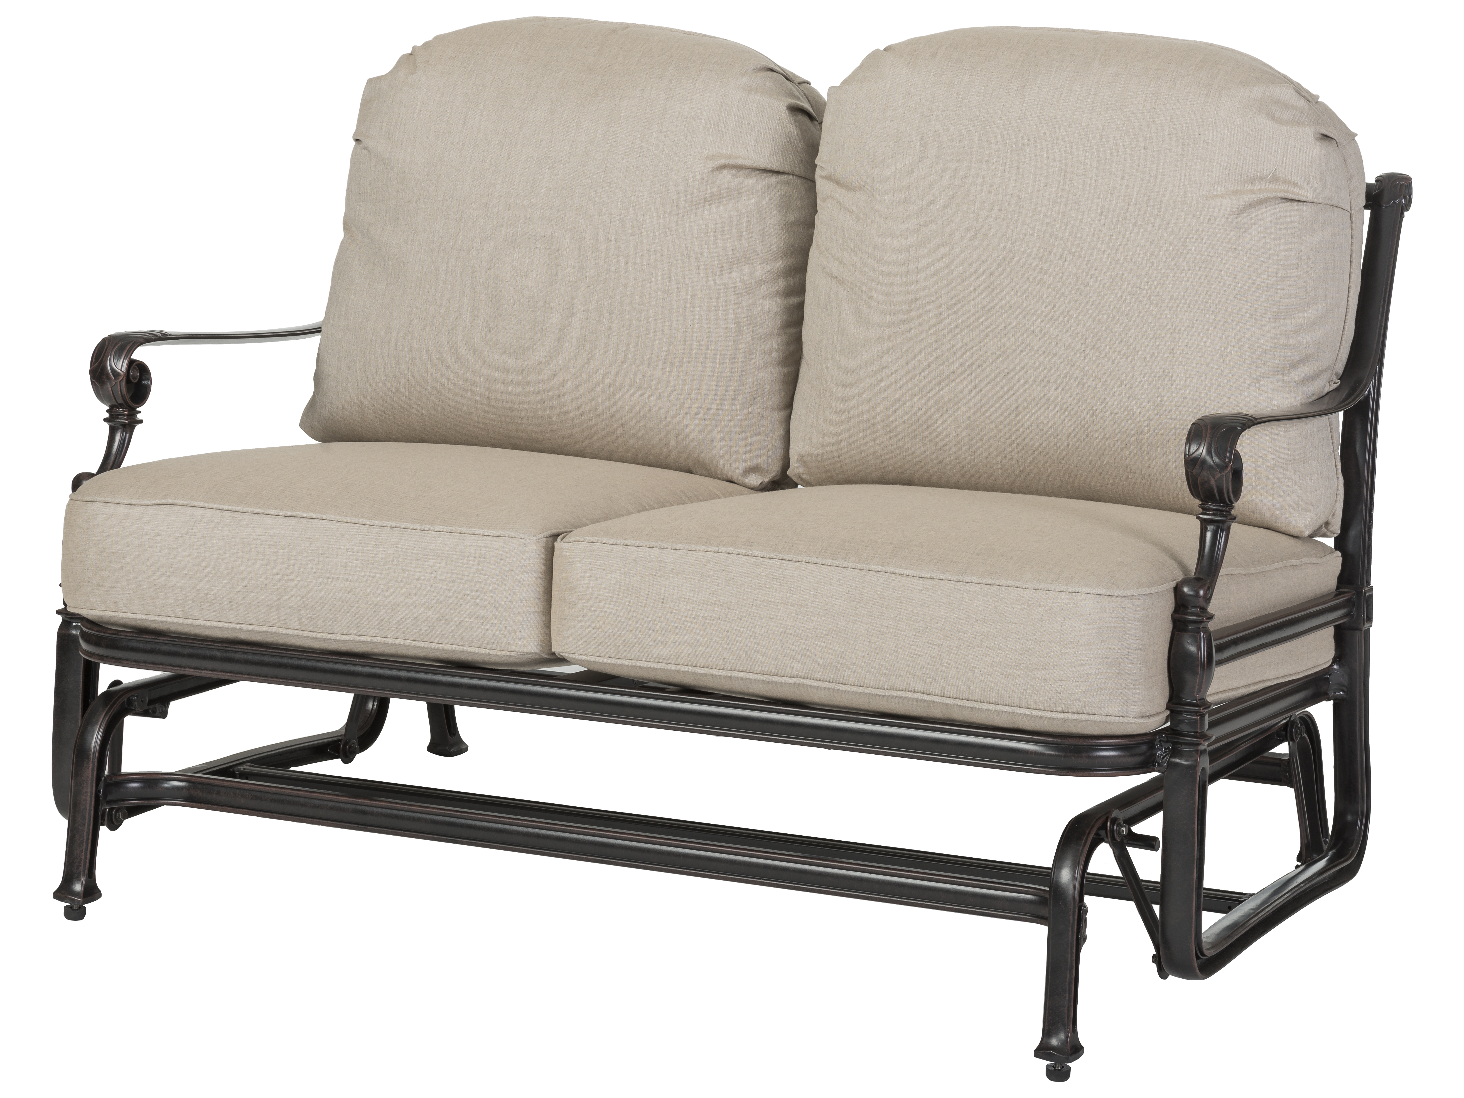 Gensun Grand Terrace Cast Aluminum Cushion Loveseat Glider